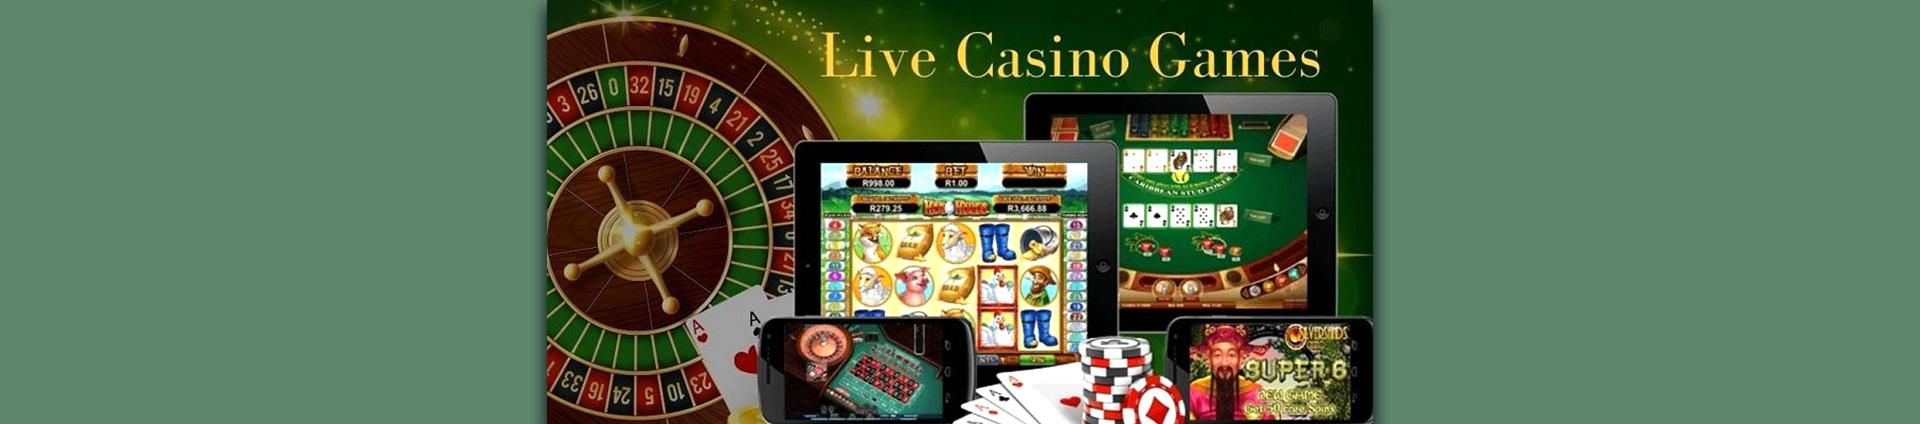 Live Casino Game Development